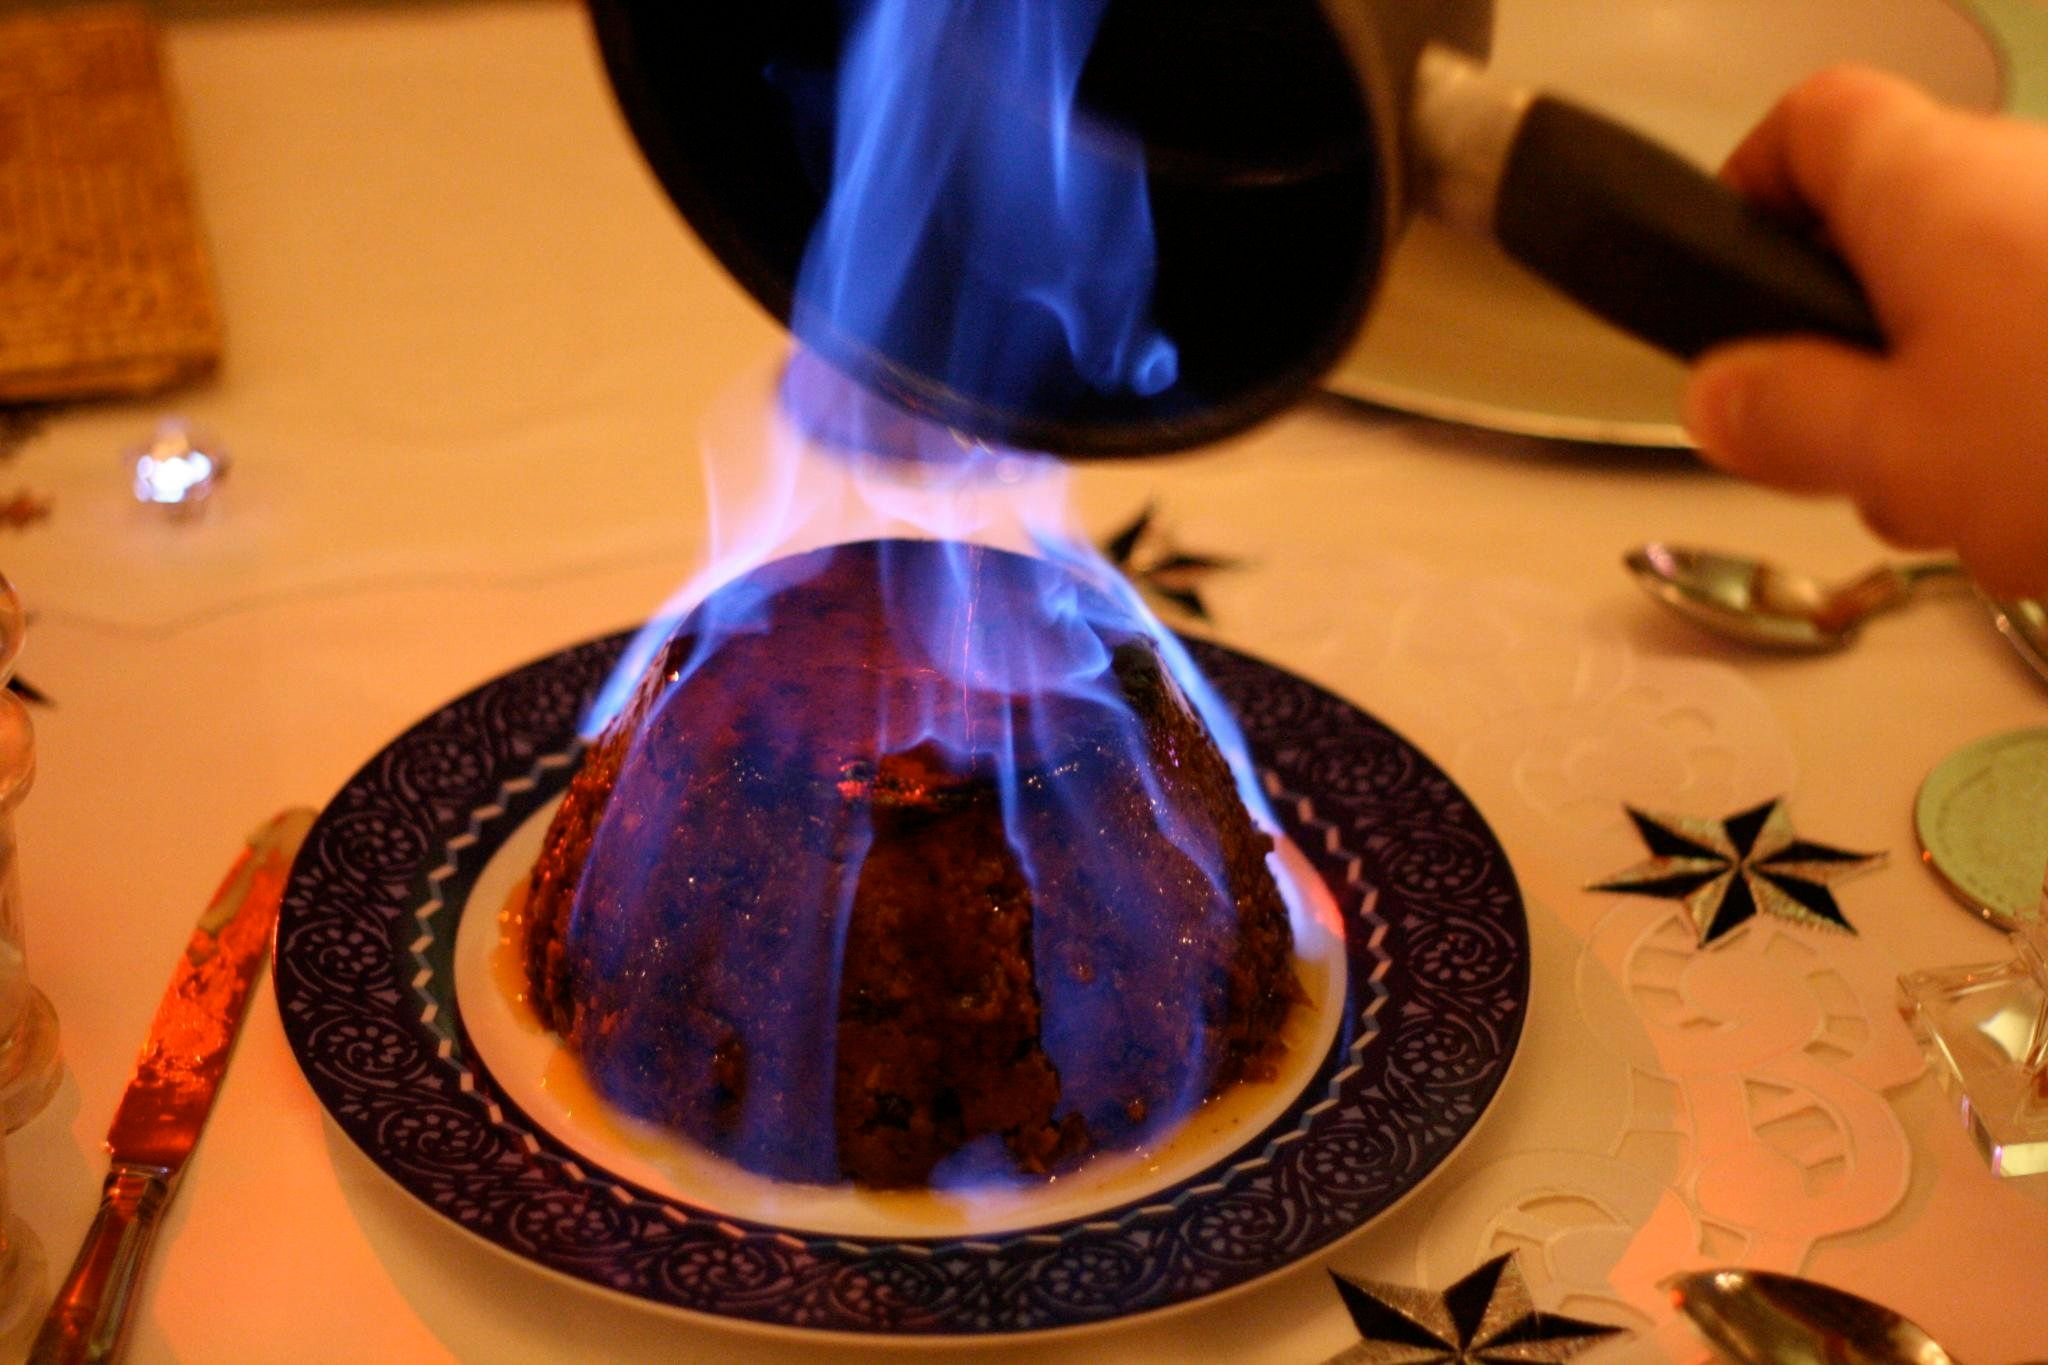 Christmas pudding alcohol fire